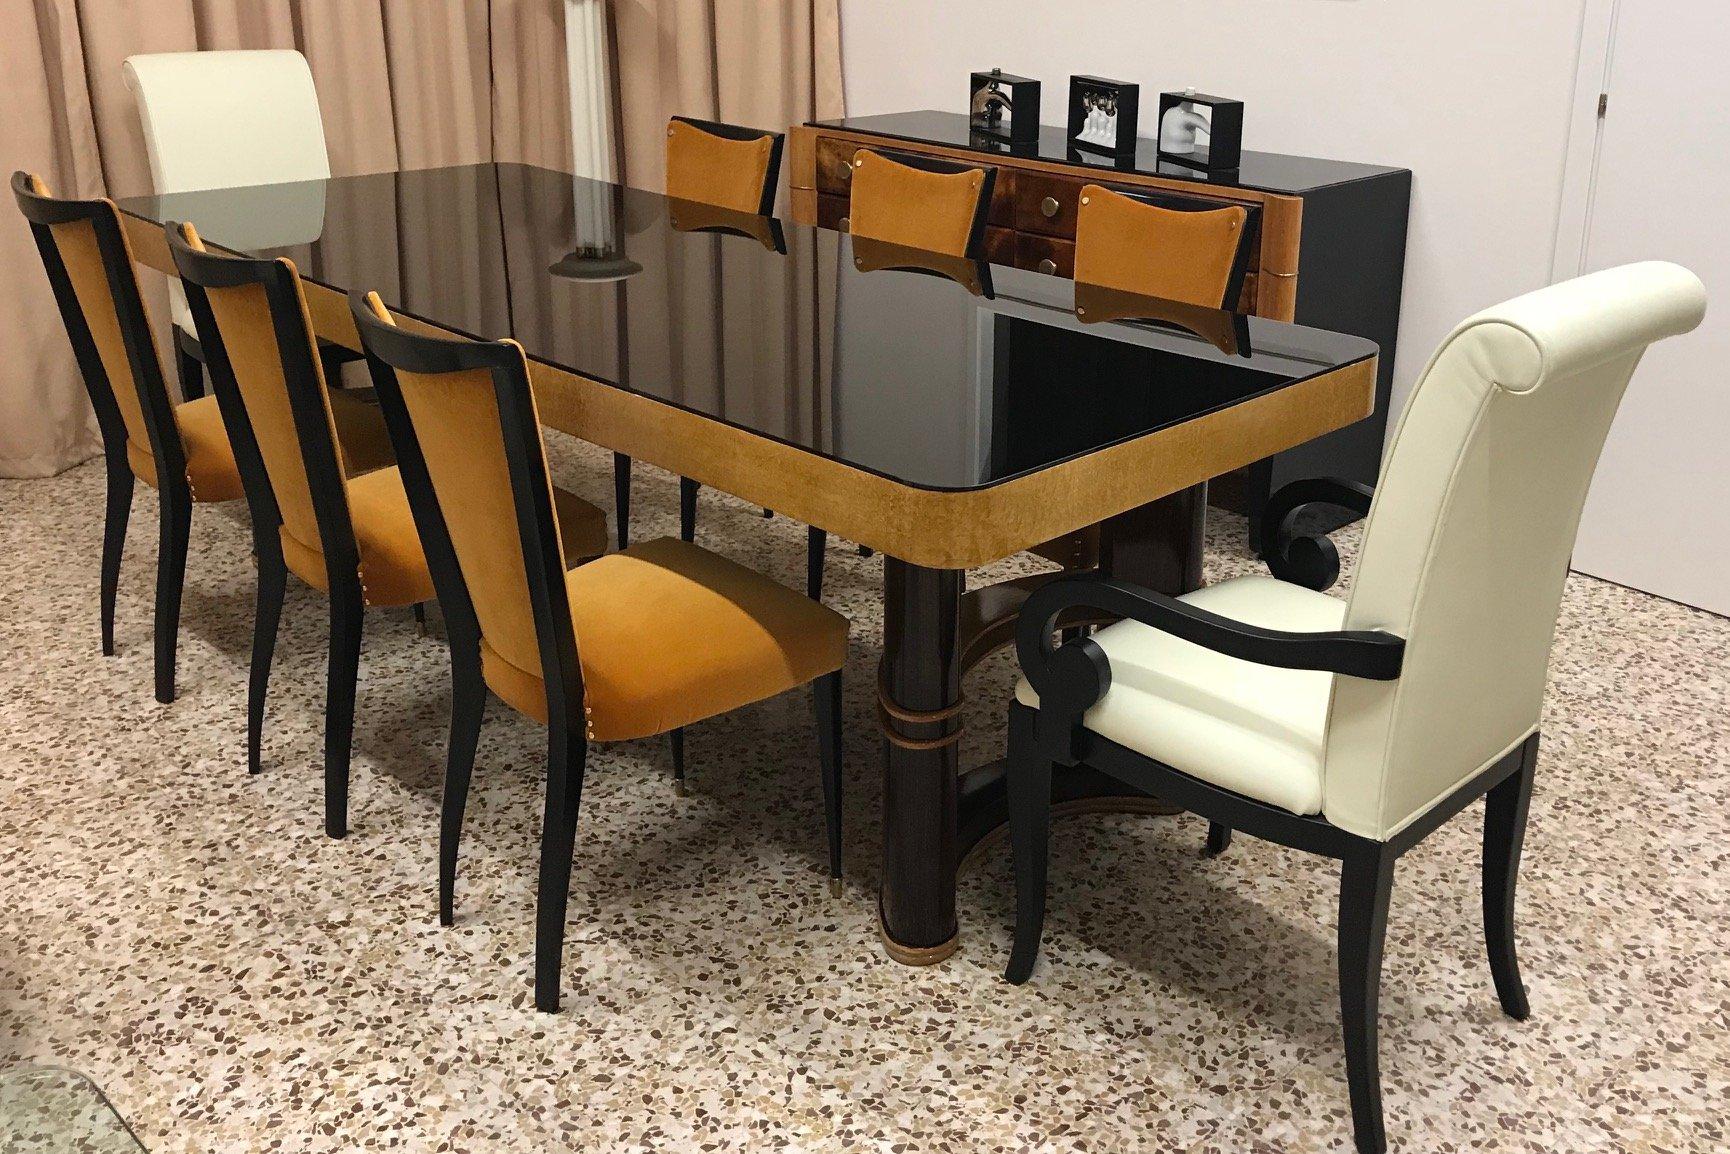 table de salle manger vintage italie 1940s en vente sur pamono. Black Bedroom Furniture Sets. Home Design Ideas